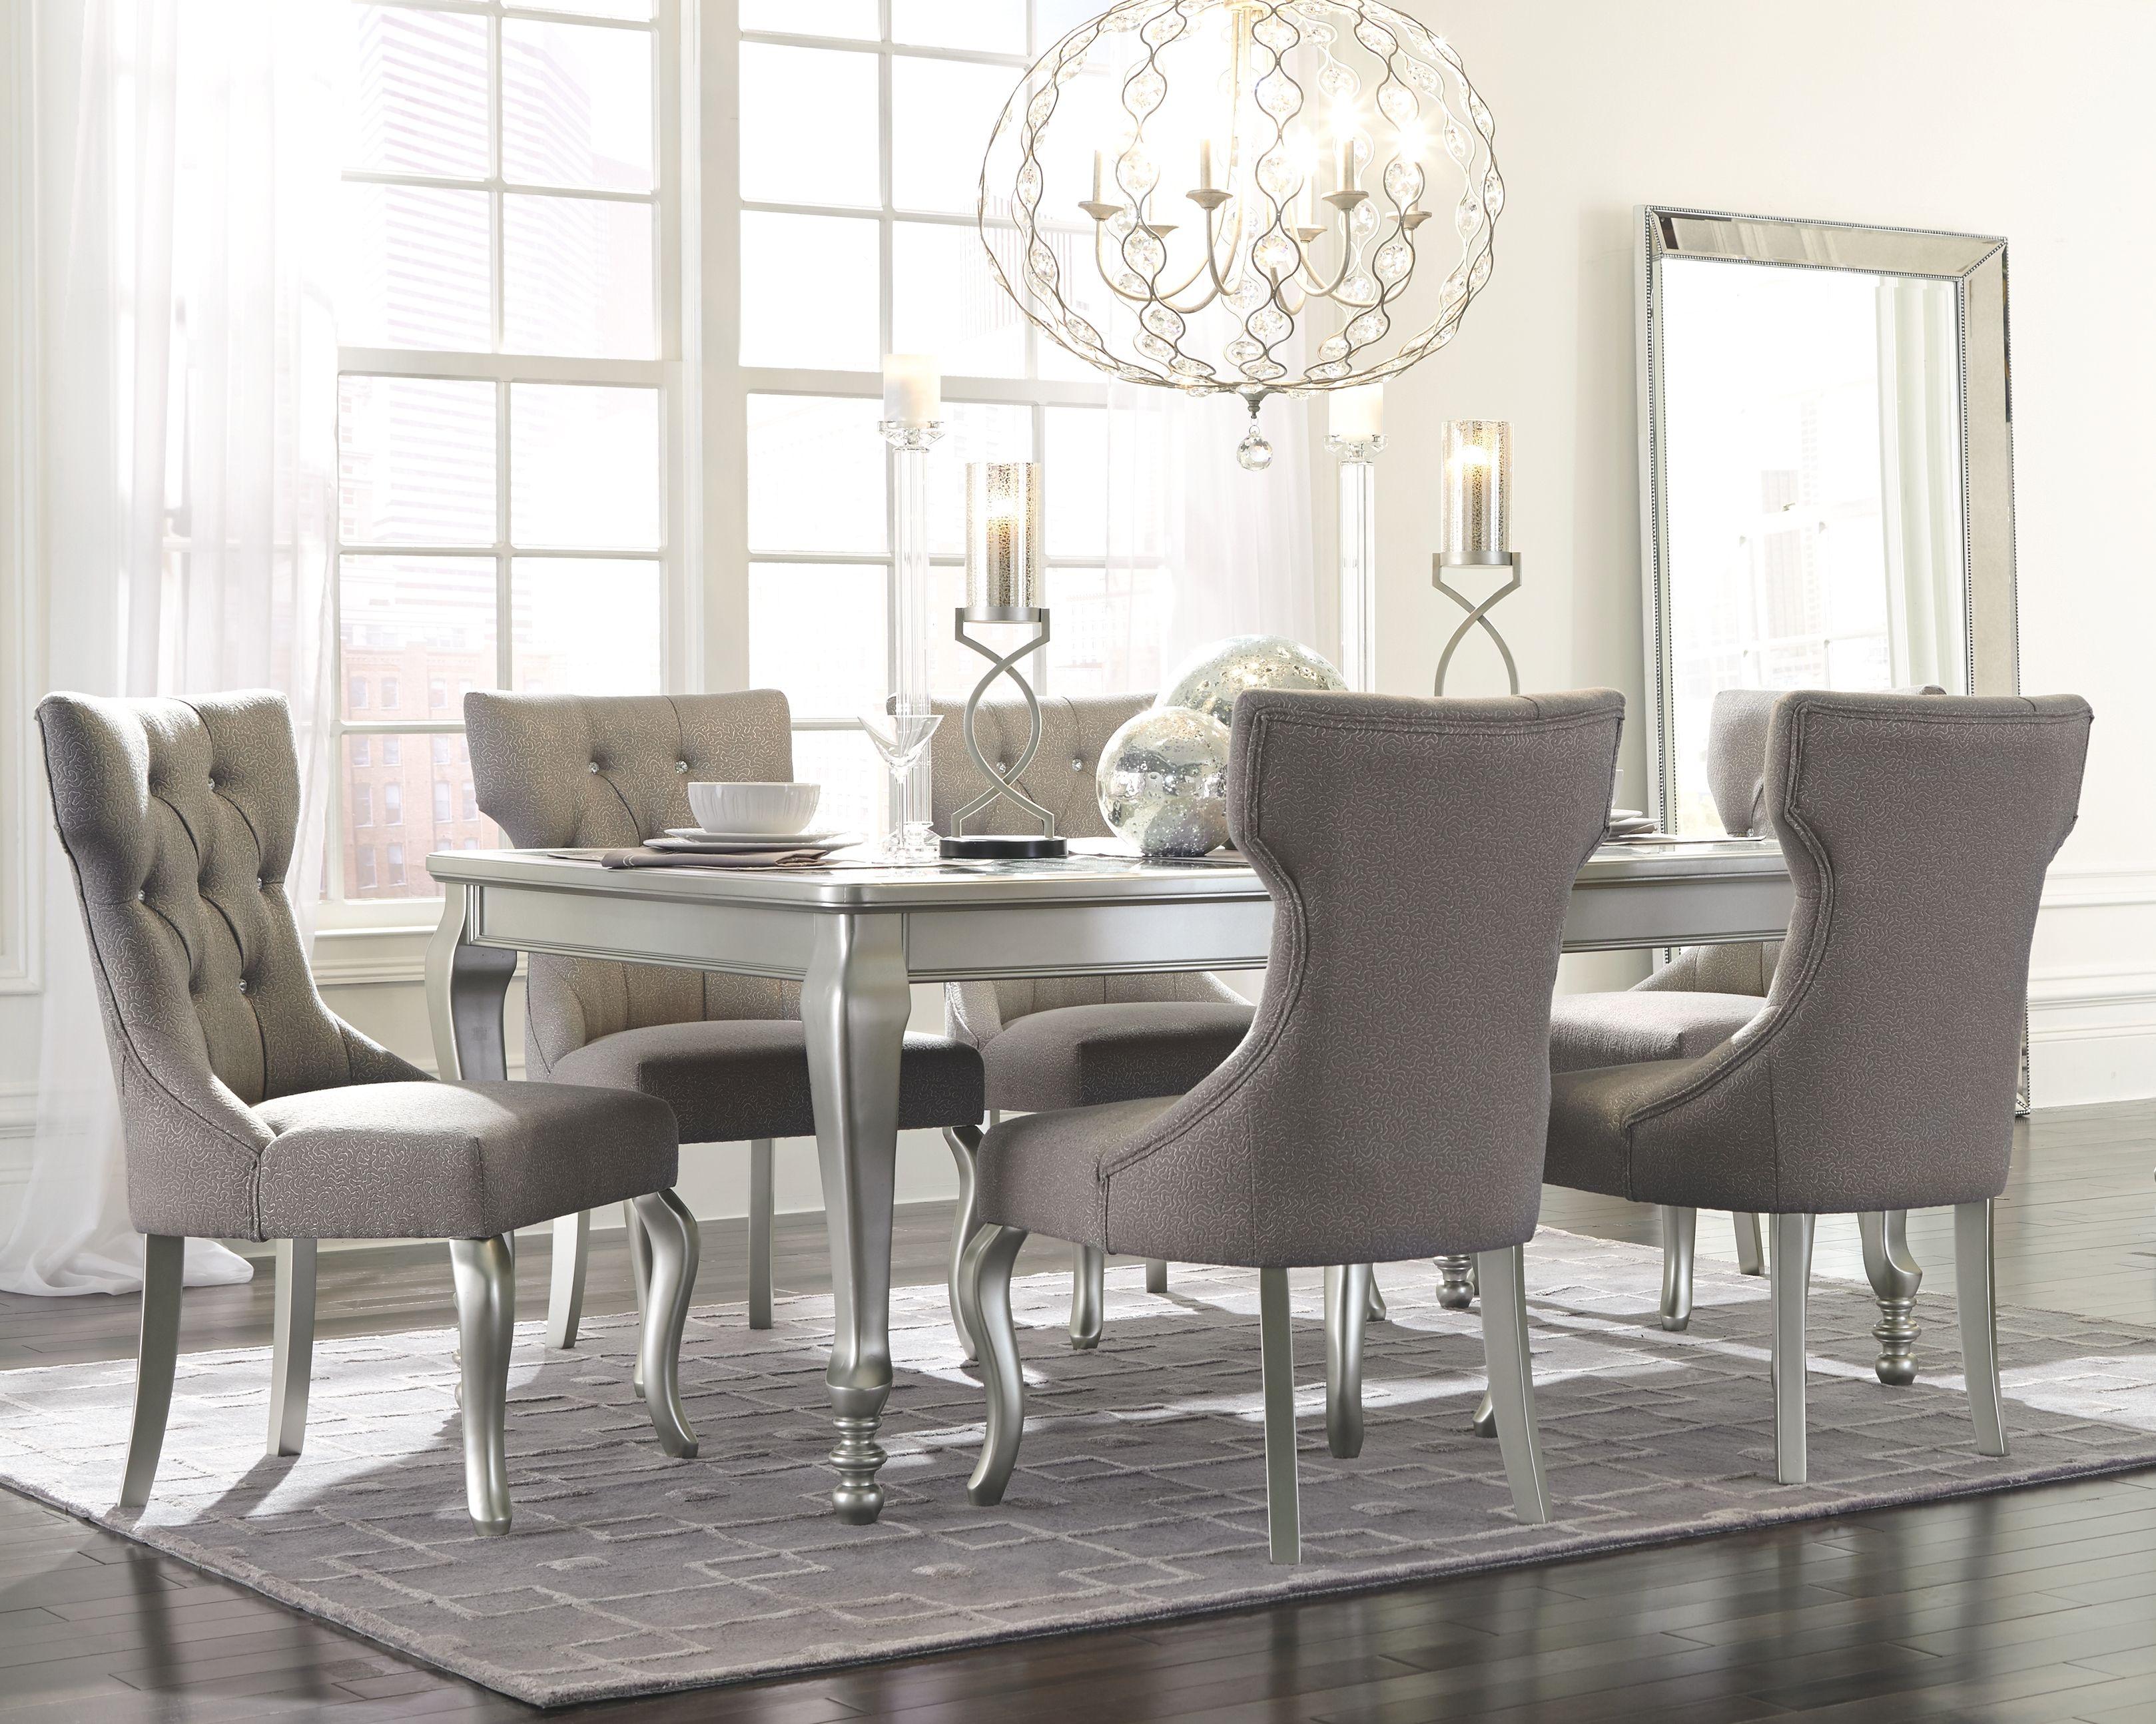 Ashley Furniture Formal Dining Room, Ashley Dining Room Sets